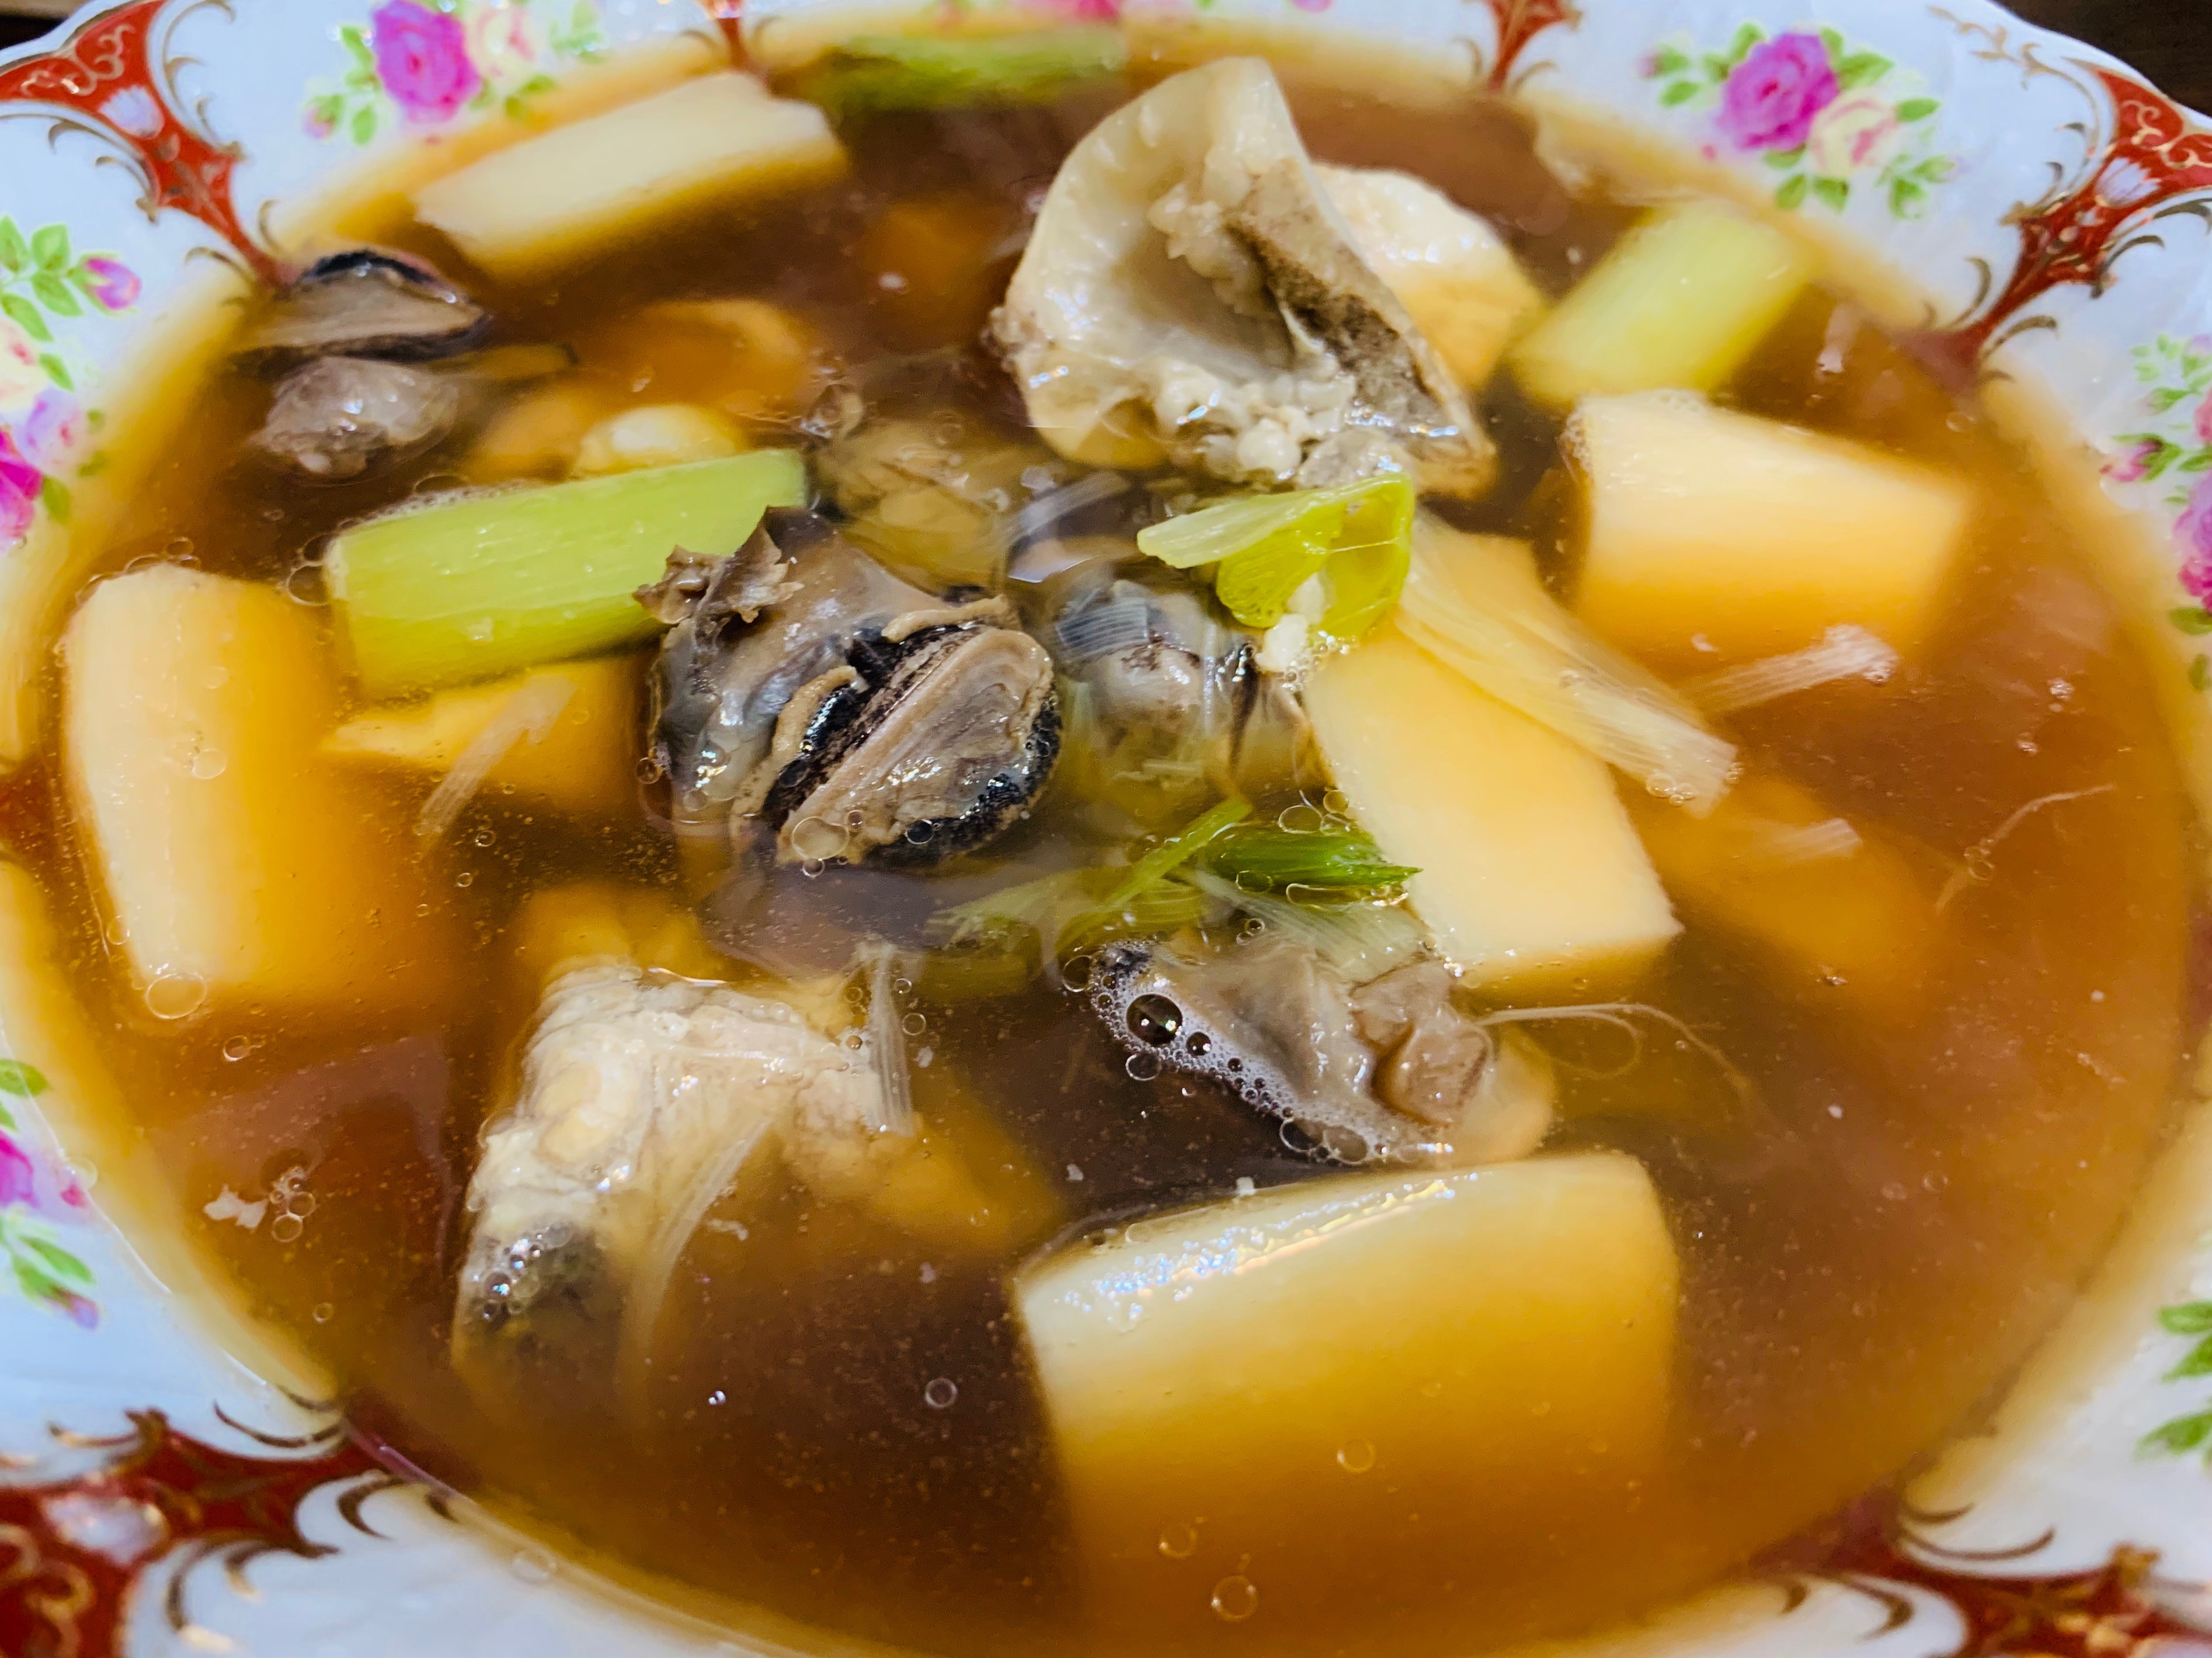 ⭐️最愛媽媽味⭐️古早味螺肉蒜湯